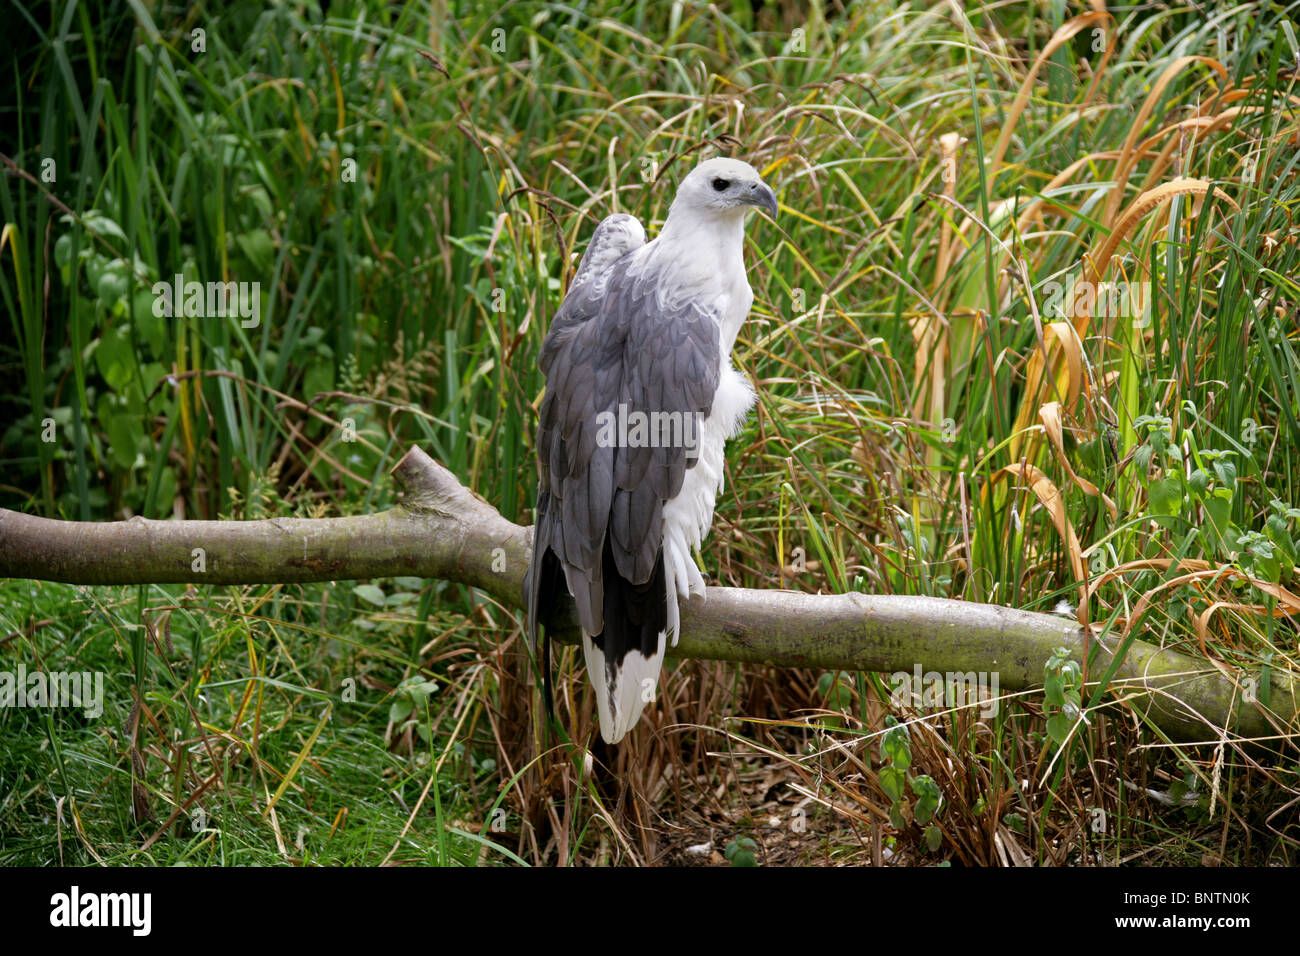 White-Bellied Sea Eagle, Haliaeetus leucogaster, Accipitridae, Accipitriformes, India, South East Asia and Australia. Stock Photo